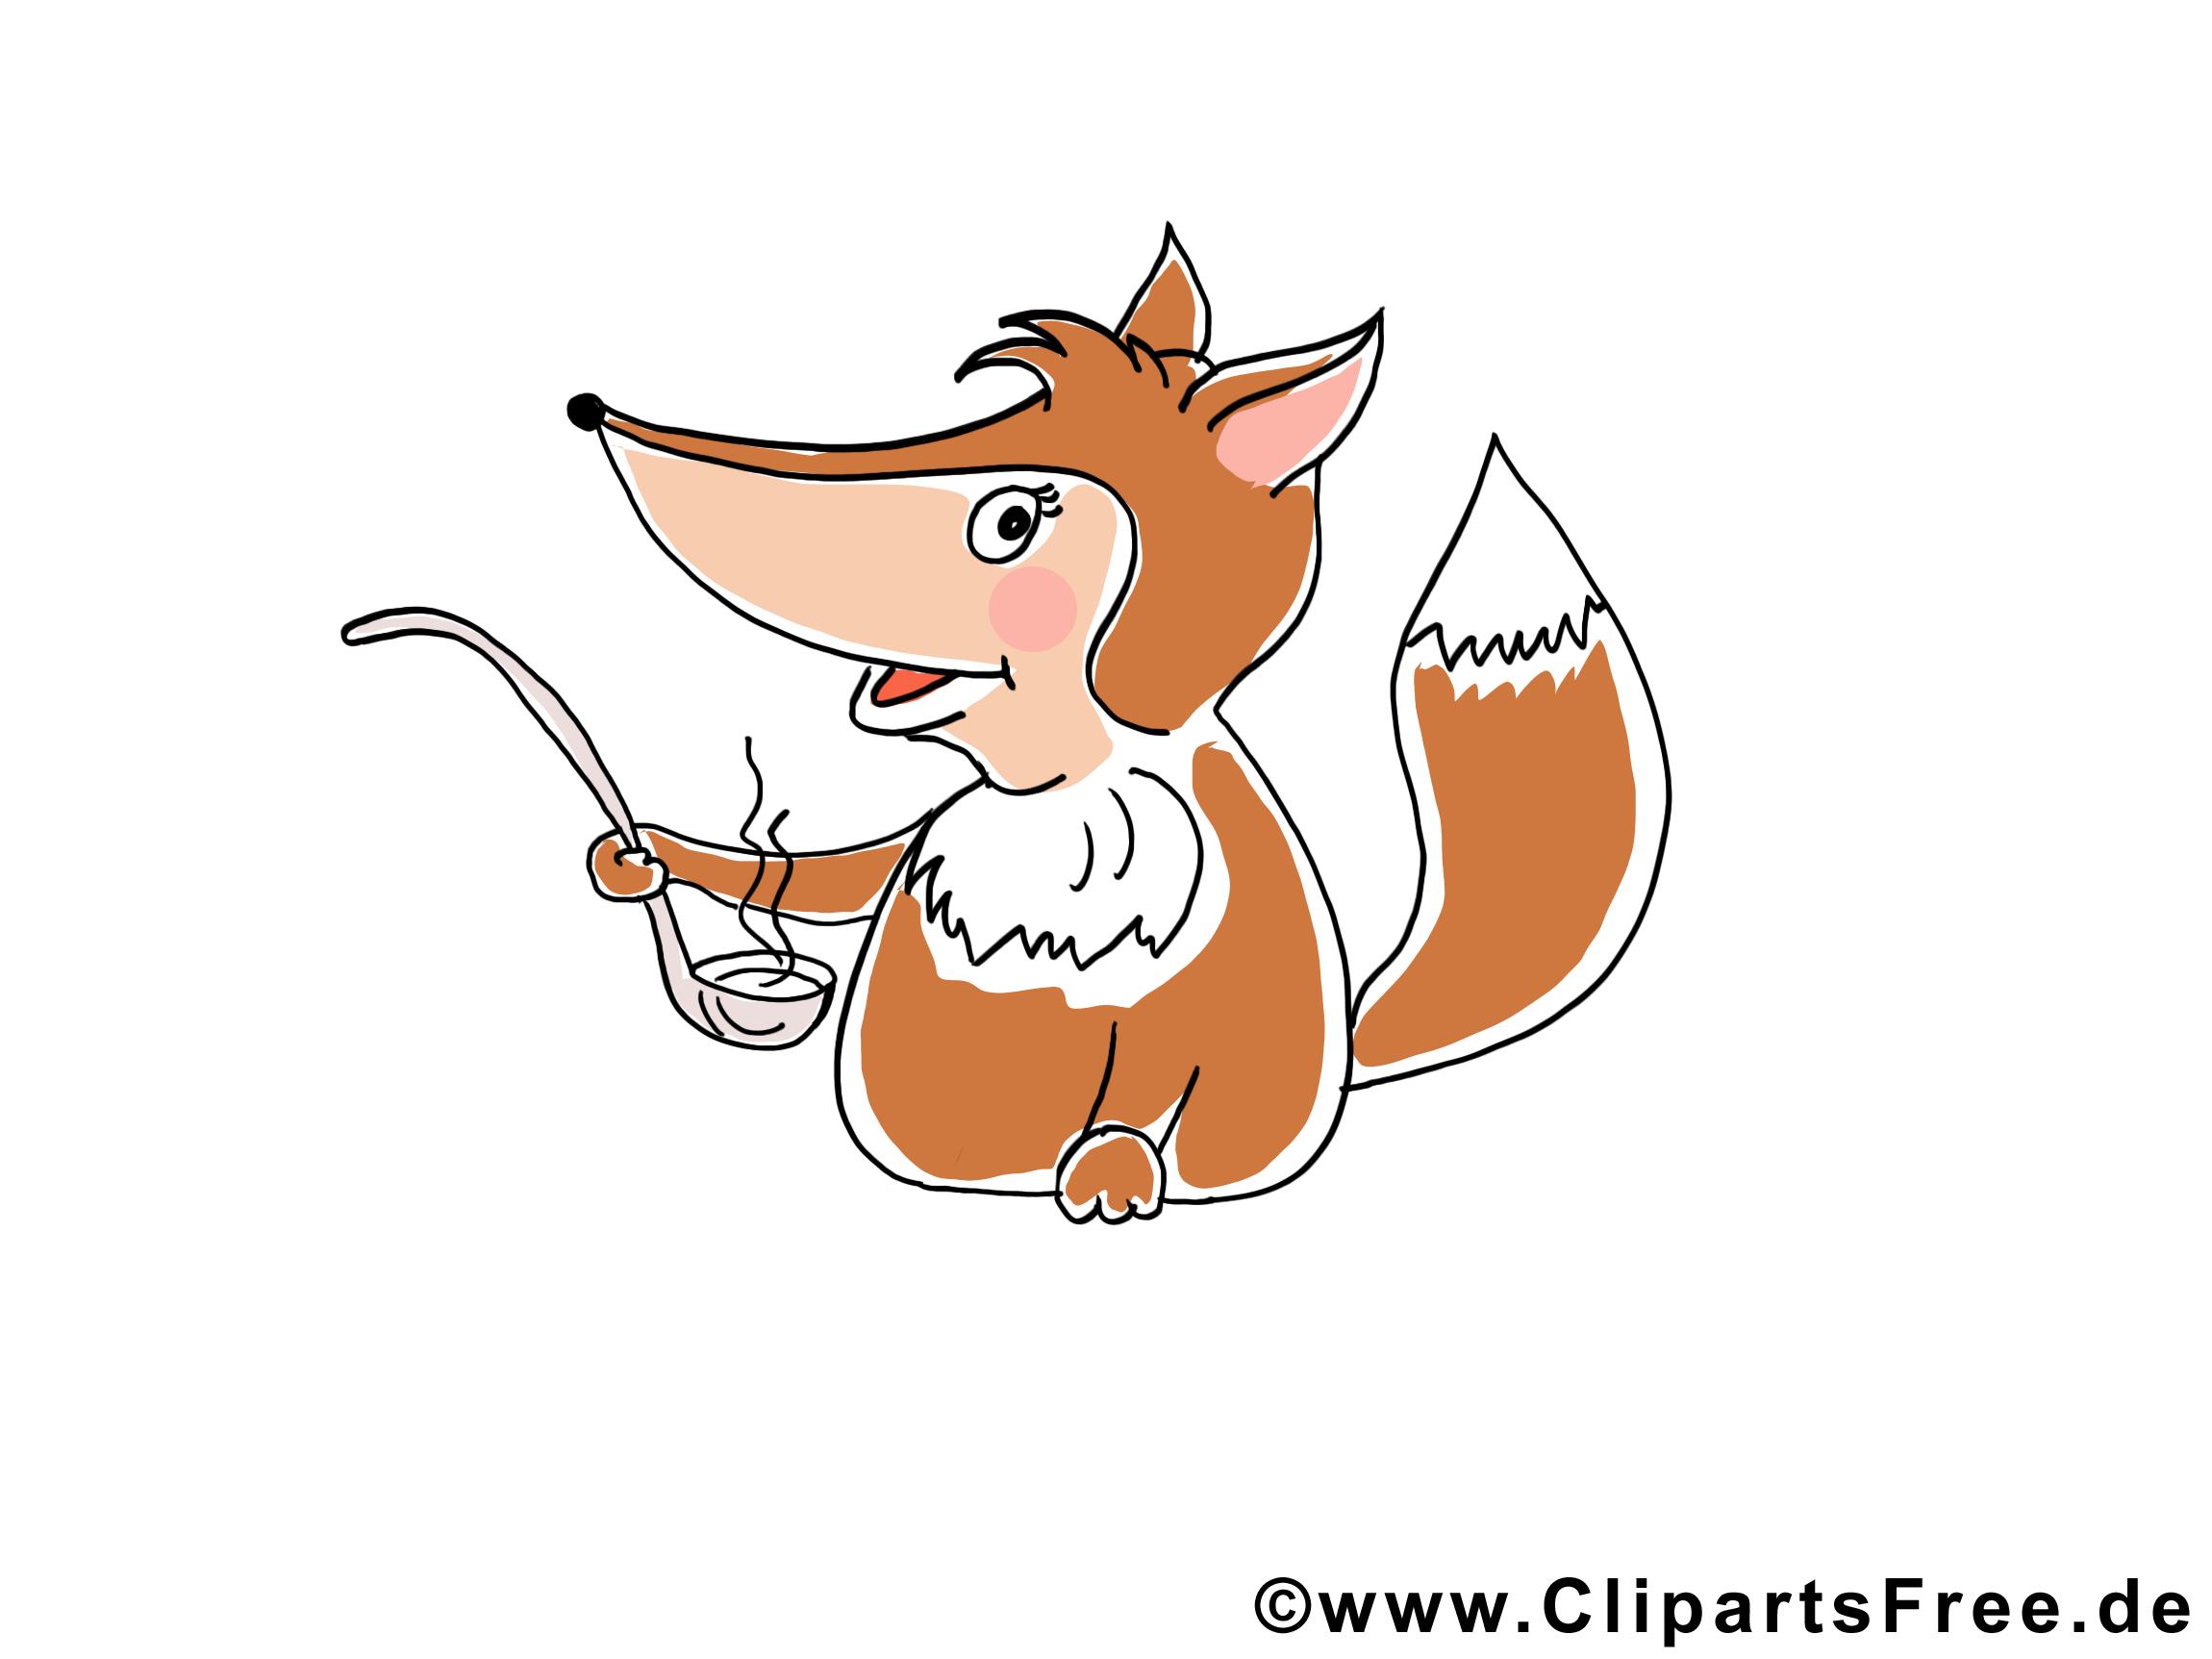 Renard image – Animal images cliparts